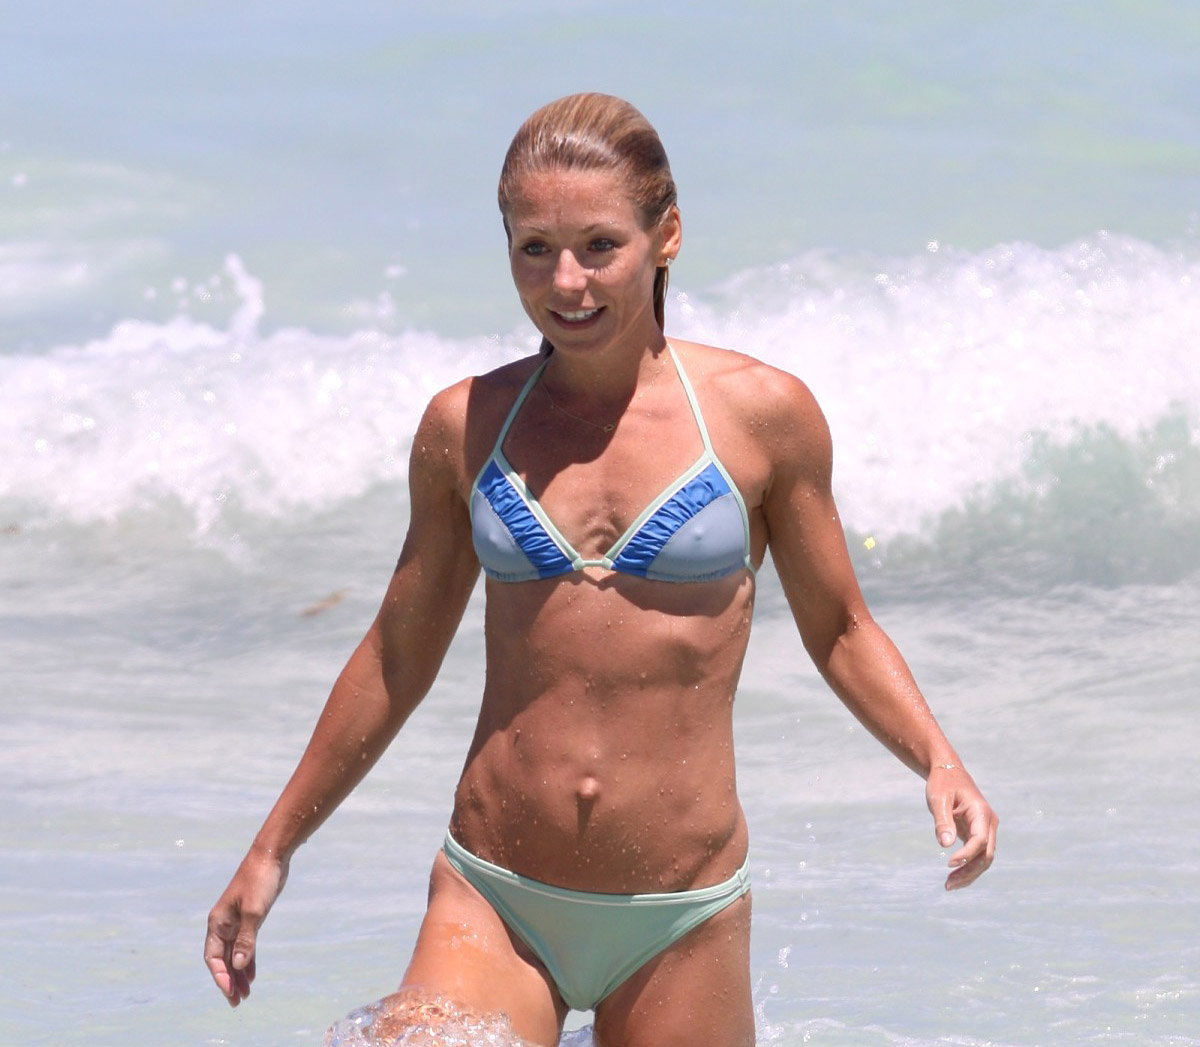 Kelly osbourne bikini pics